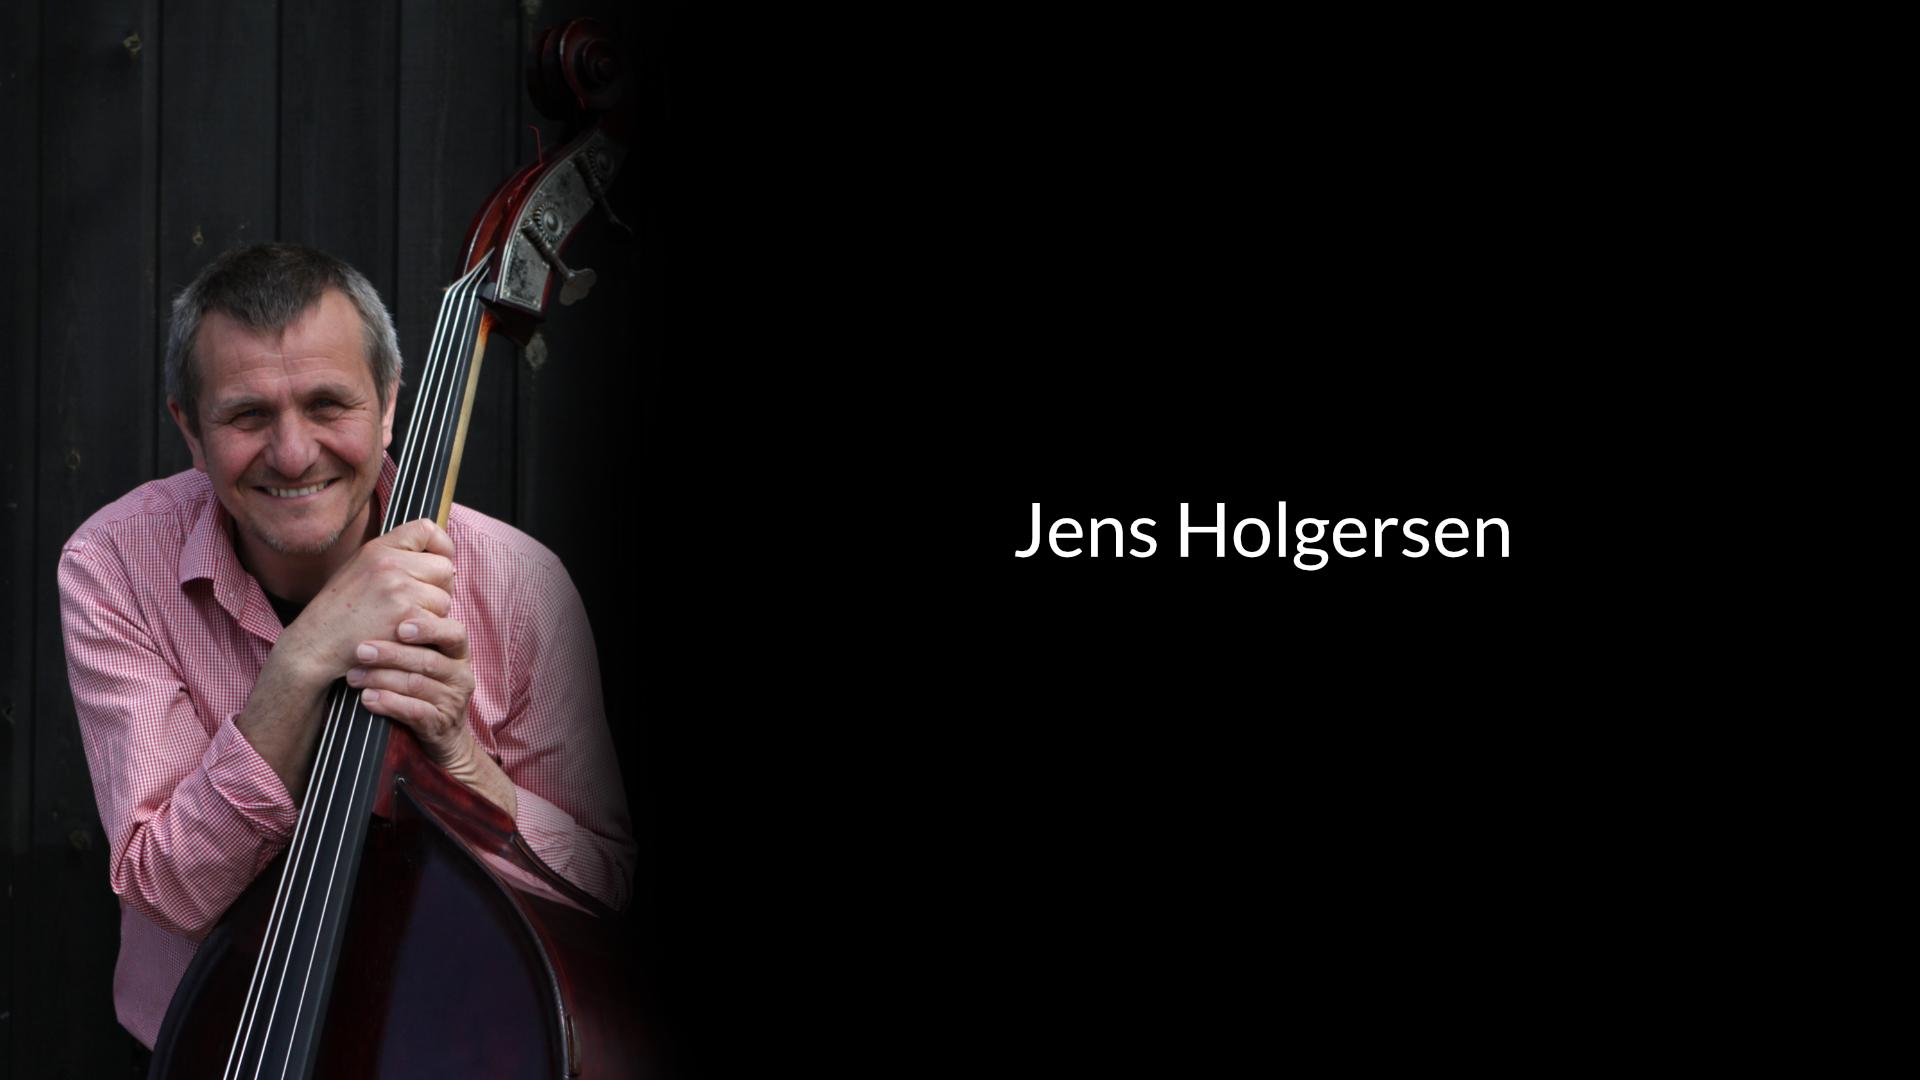 Jens Holgersen